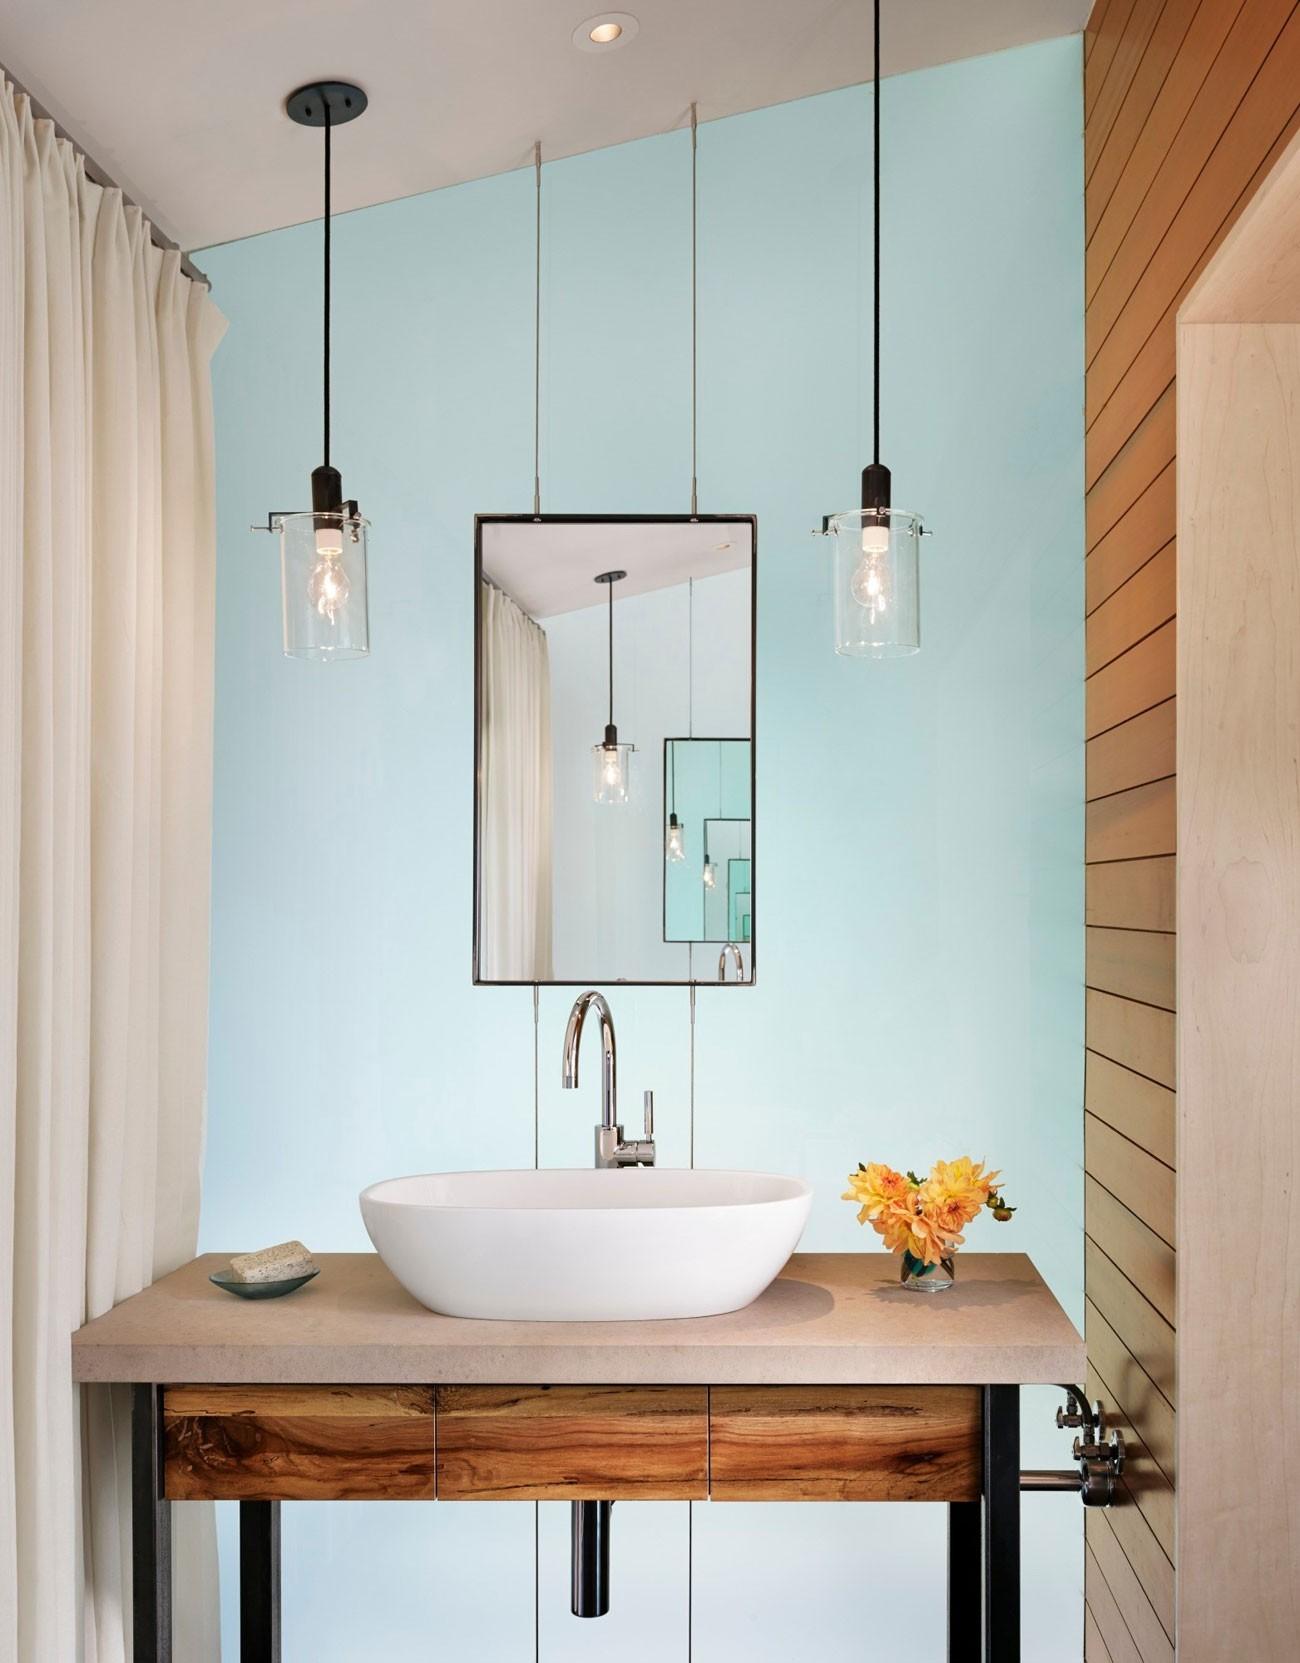 Hanging Bathroom Lights Sensational Innovation Design Hanging Bathroom Light Fixtures for Bathrooms Collection